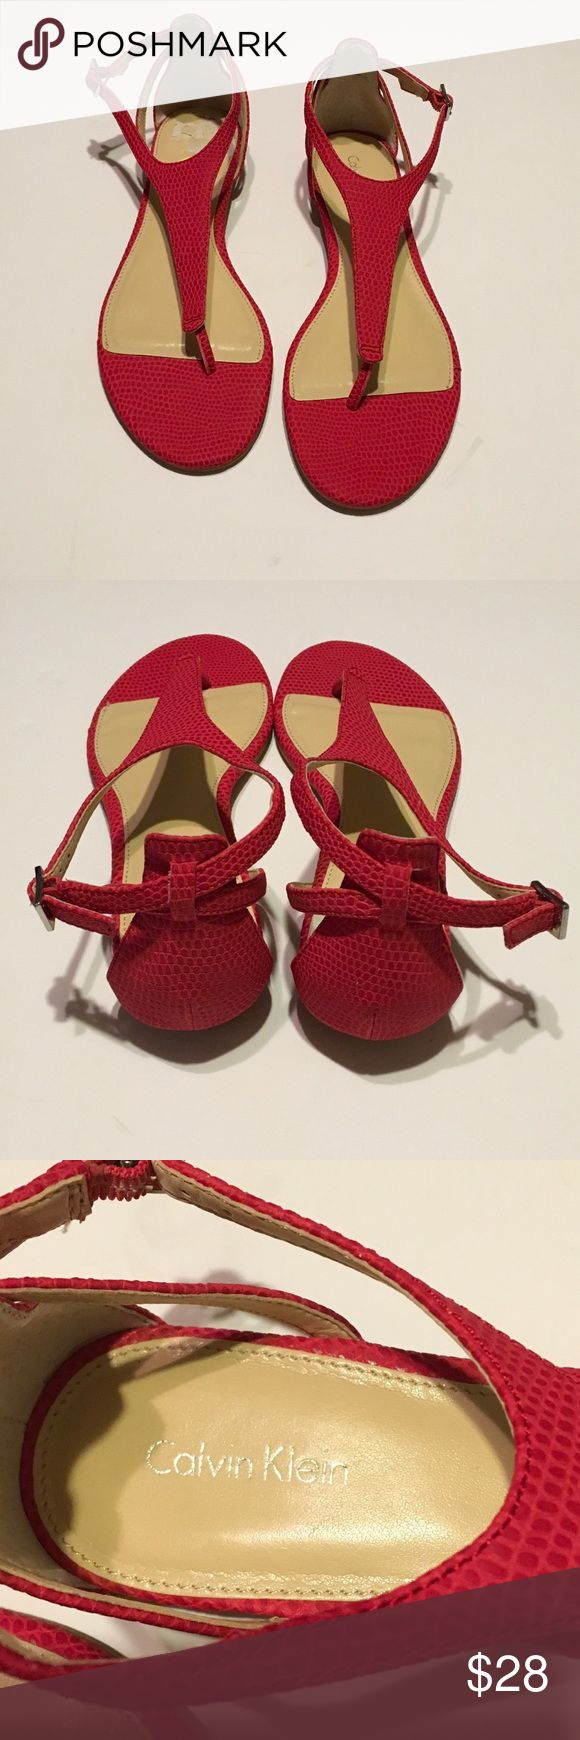 Calvin Klein Sandals Red in new condition Calvin Klein Shoes Sandals